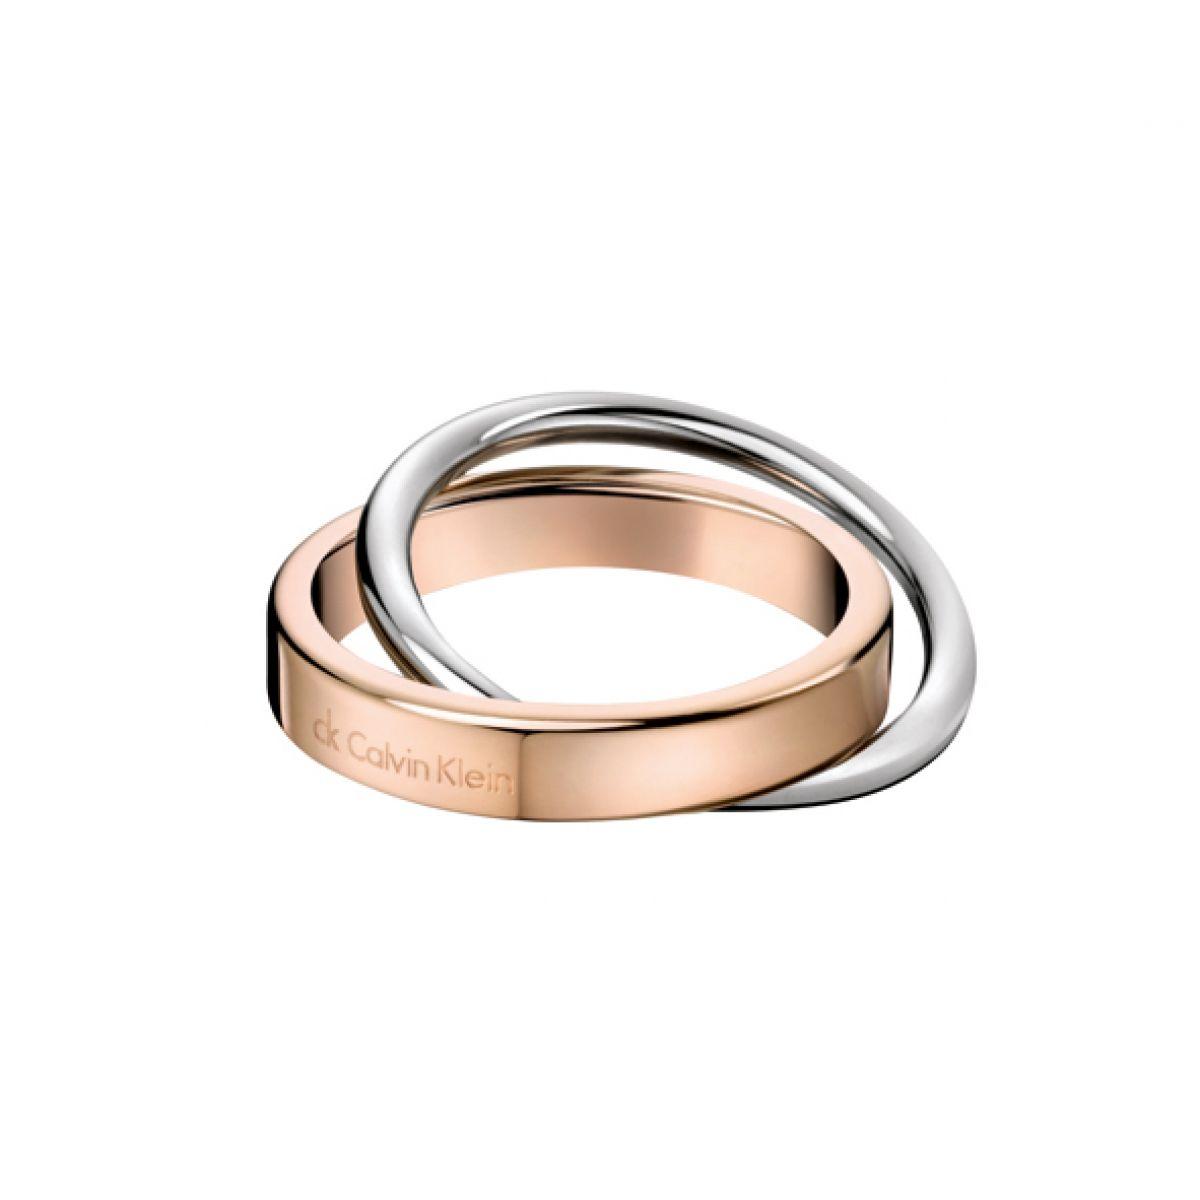 calvin klein ring dam